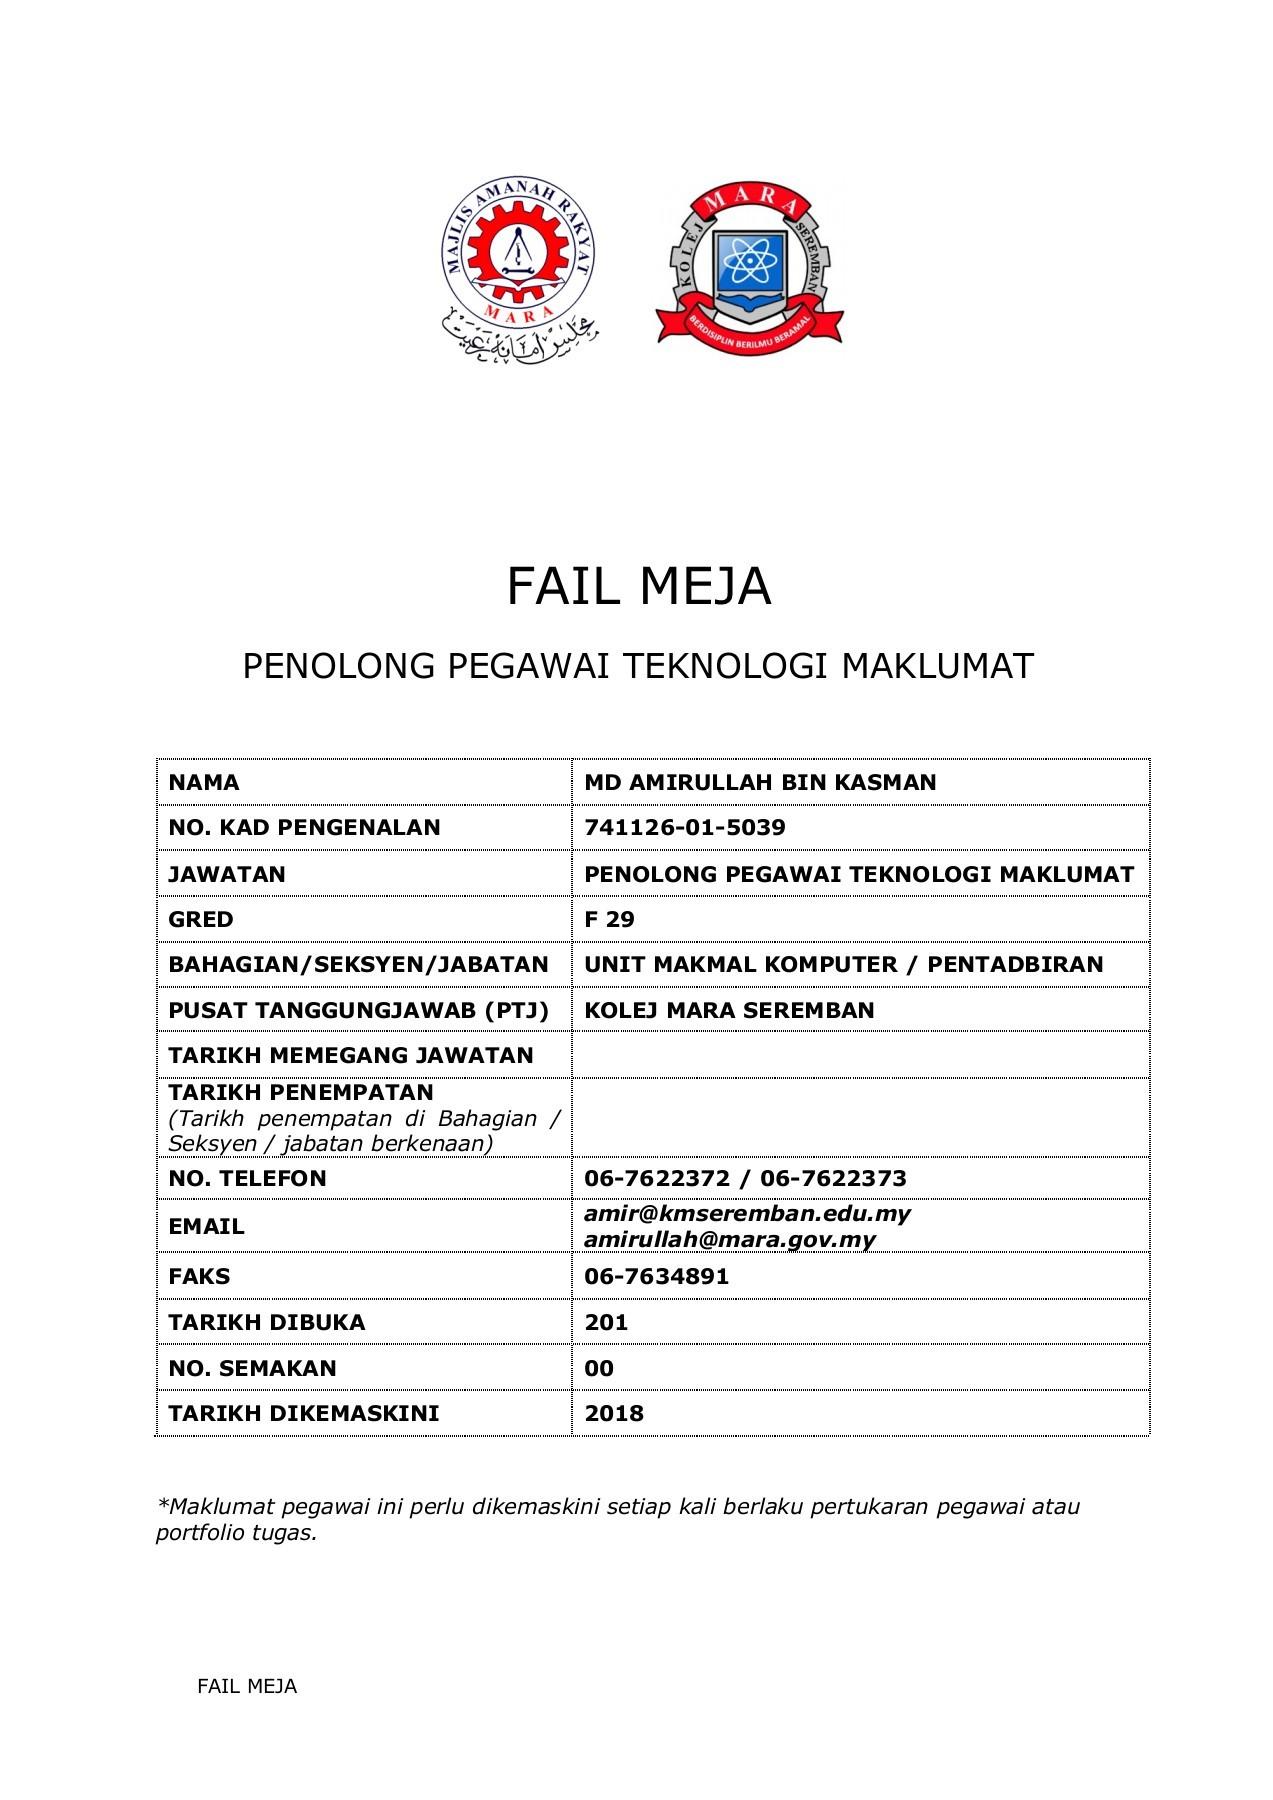 Fm Fa29 Md Amirullah B Kasman Flip Book Pages 1 50 Pubhtml5